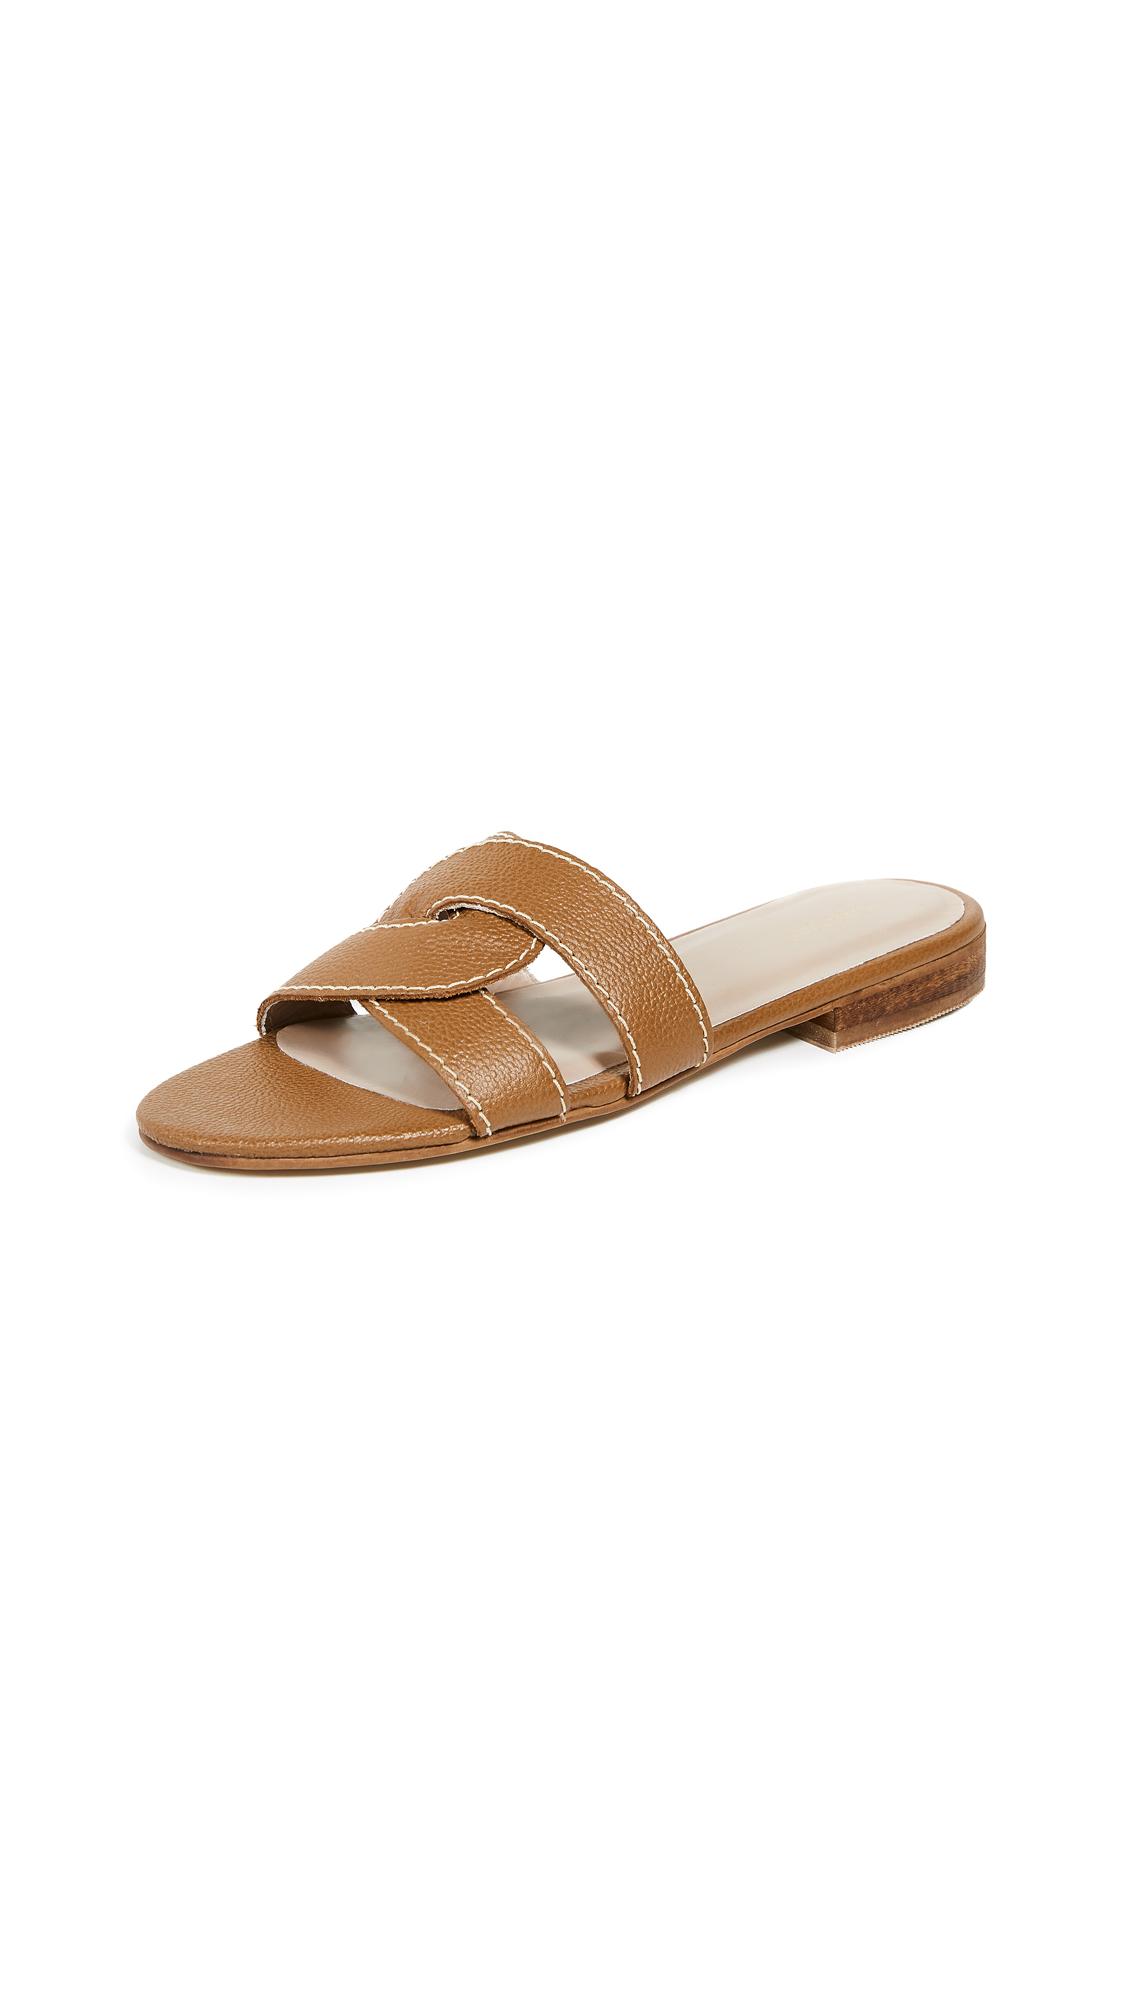 KAANAS Santorini Infinity Sandals - Honey